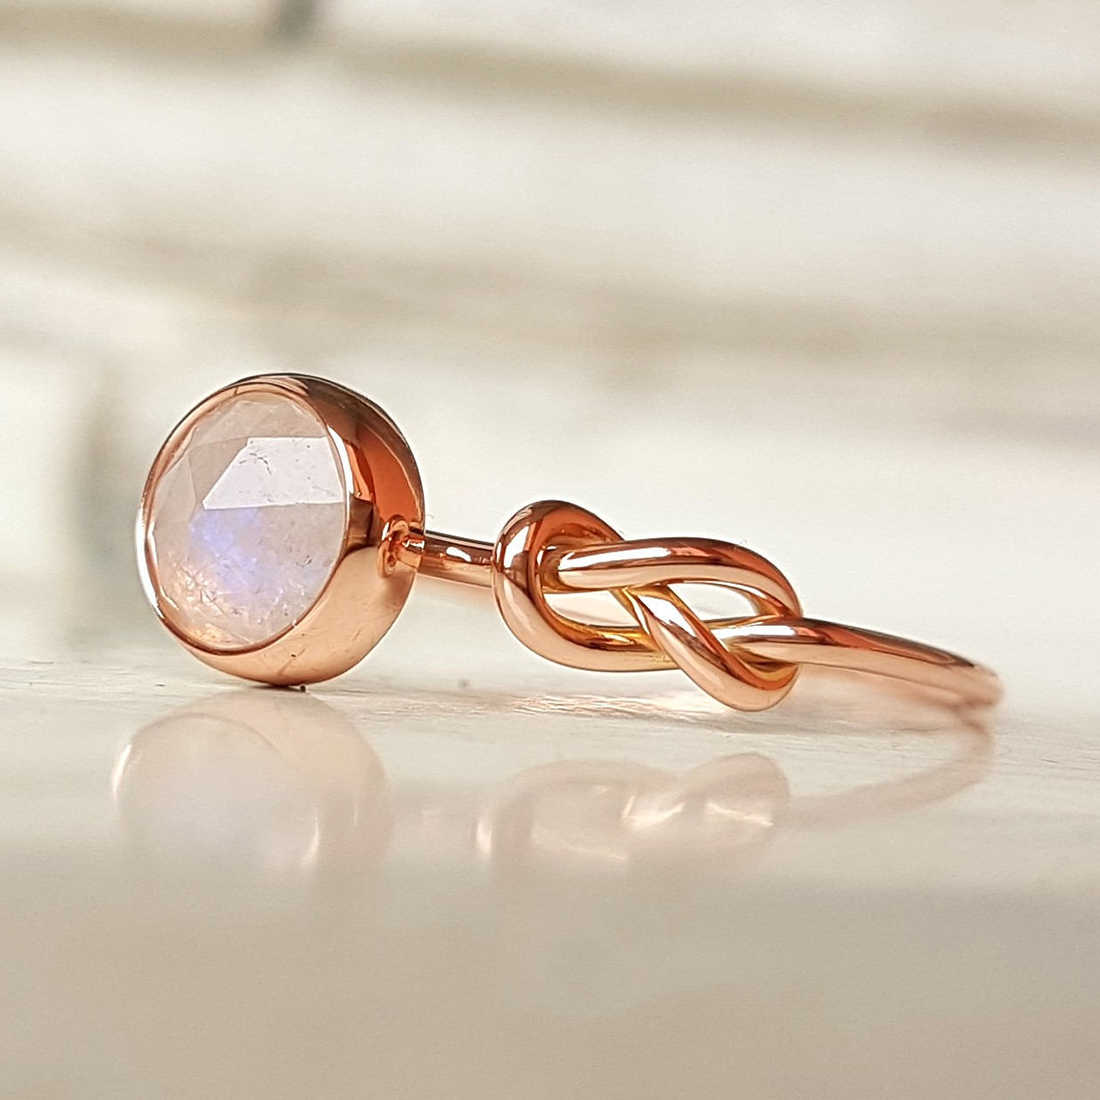 Jiayiqi แฟชั่นออกแบบใหม่โอปอล Rose Gold สี Zircon แหวนผู้หญิงเครื่องประดับของขวัญหมั้นแหวน